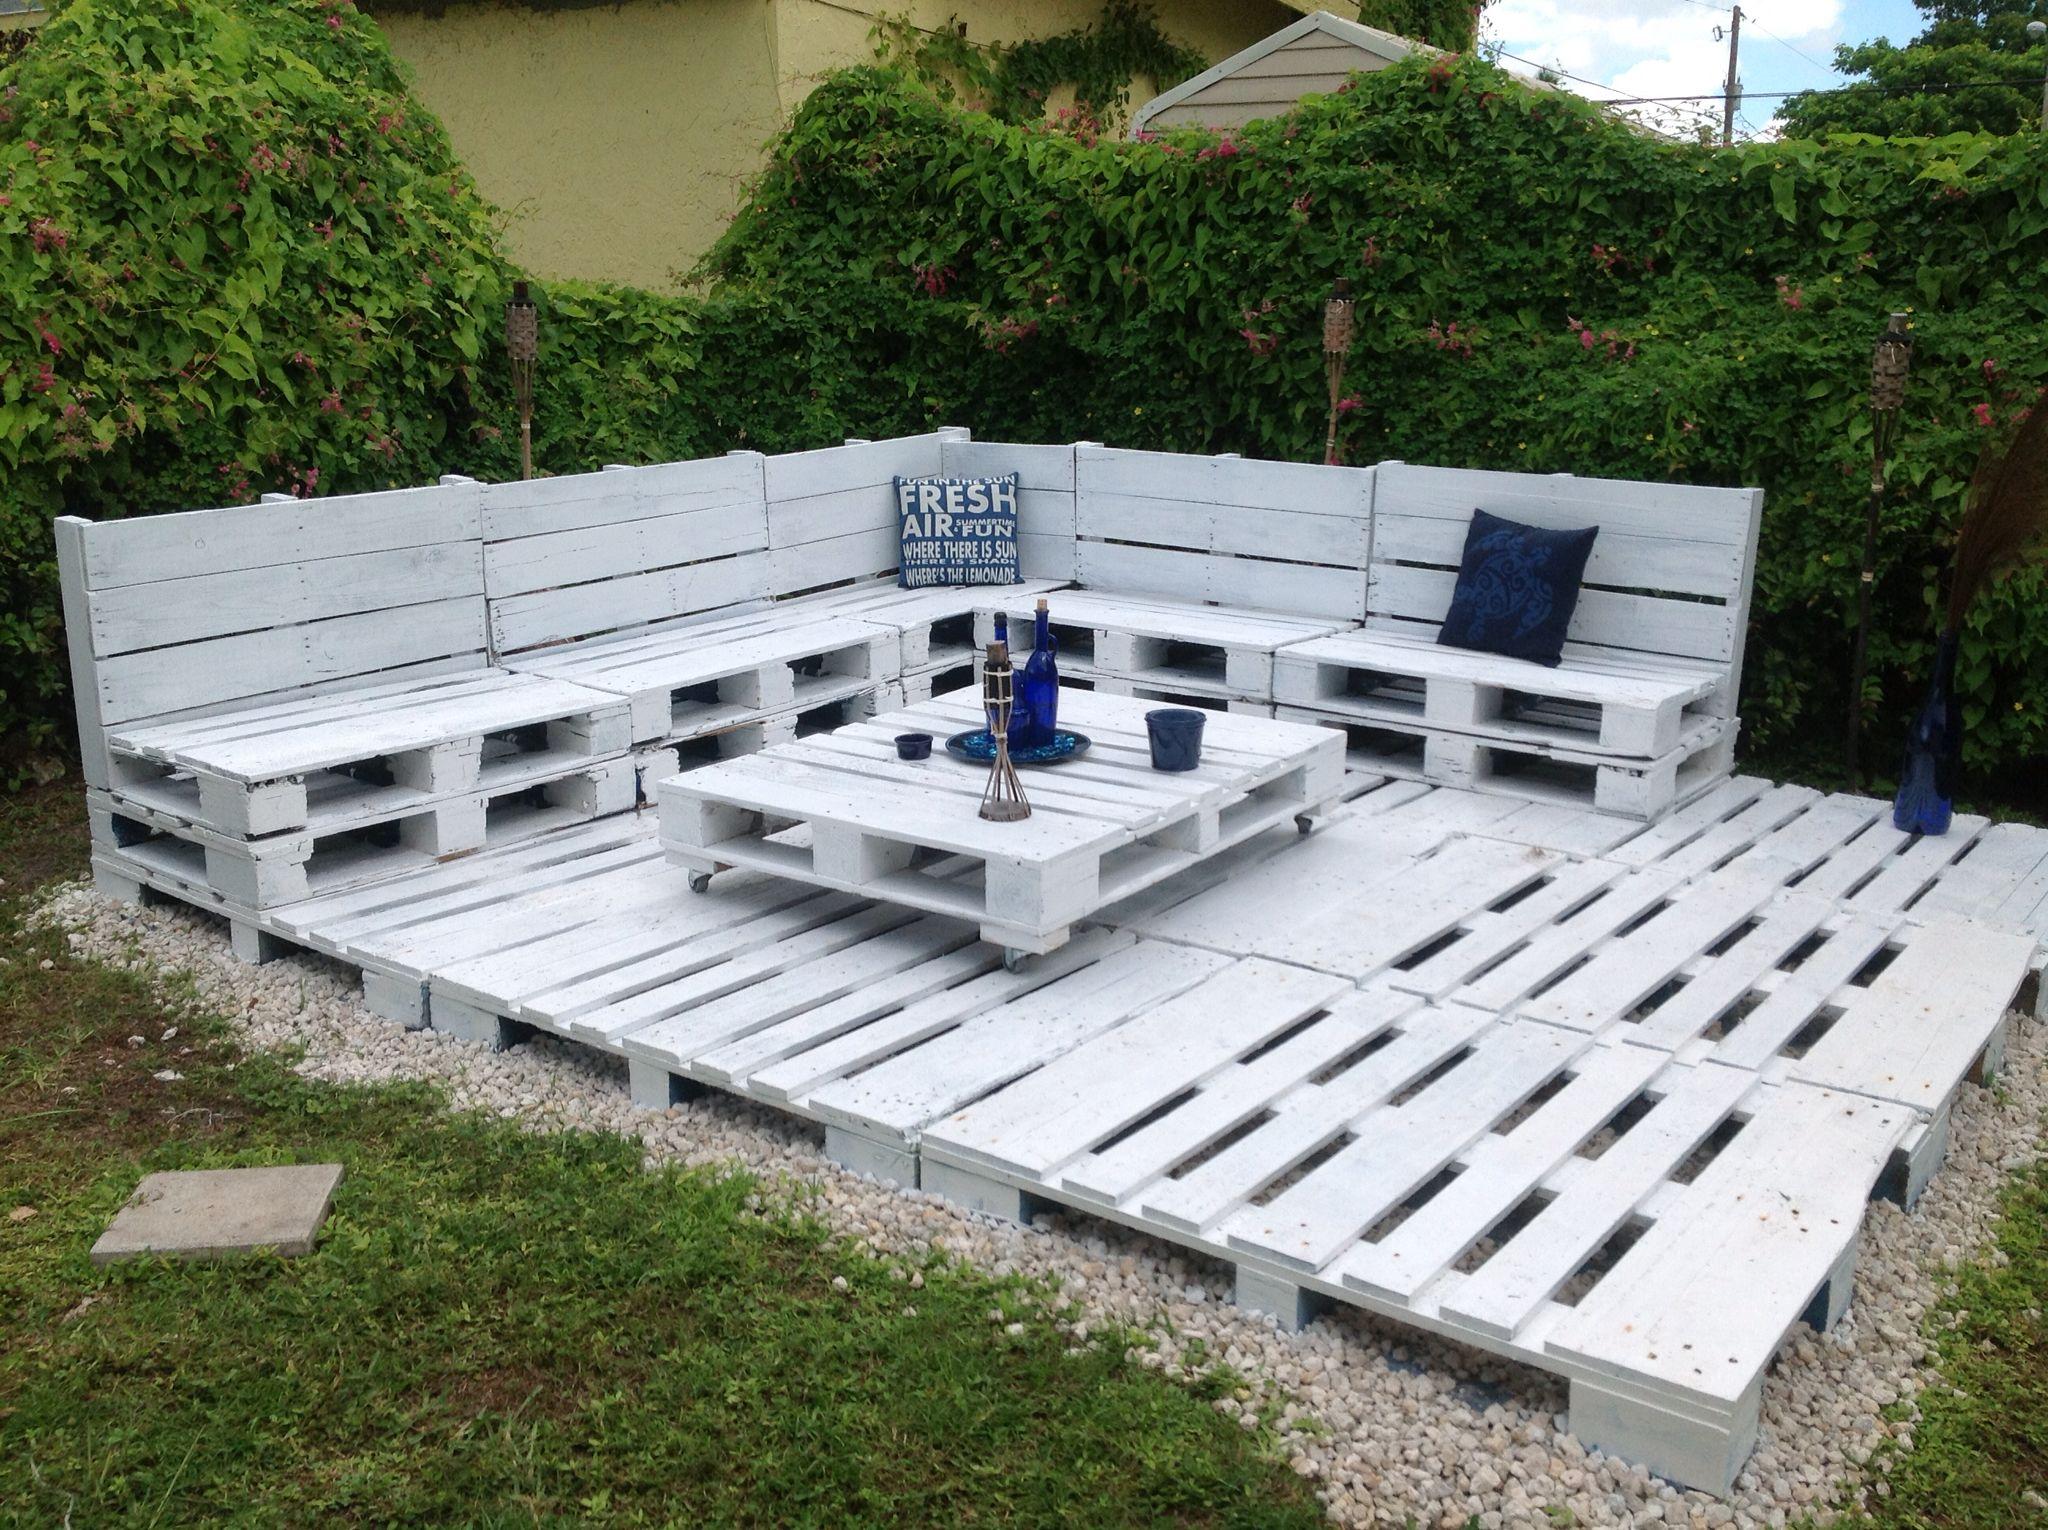 Mobili Da Giardino Con Pallet in 2020 (with images)